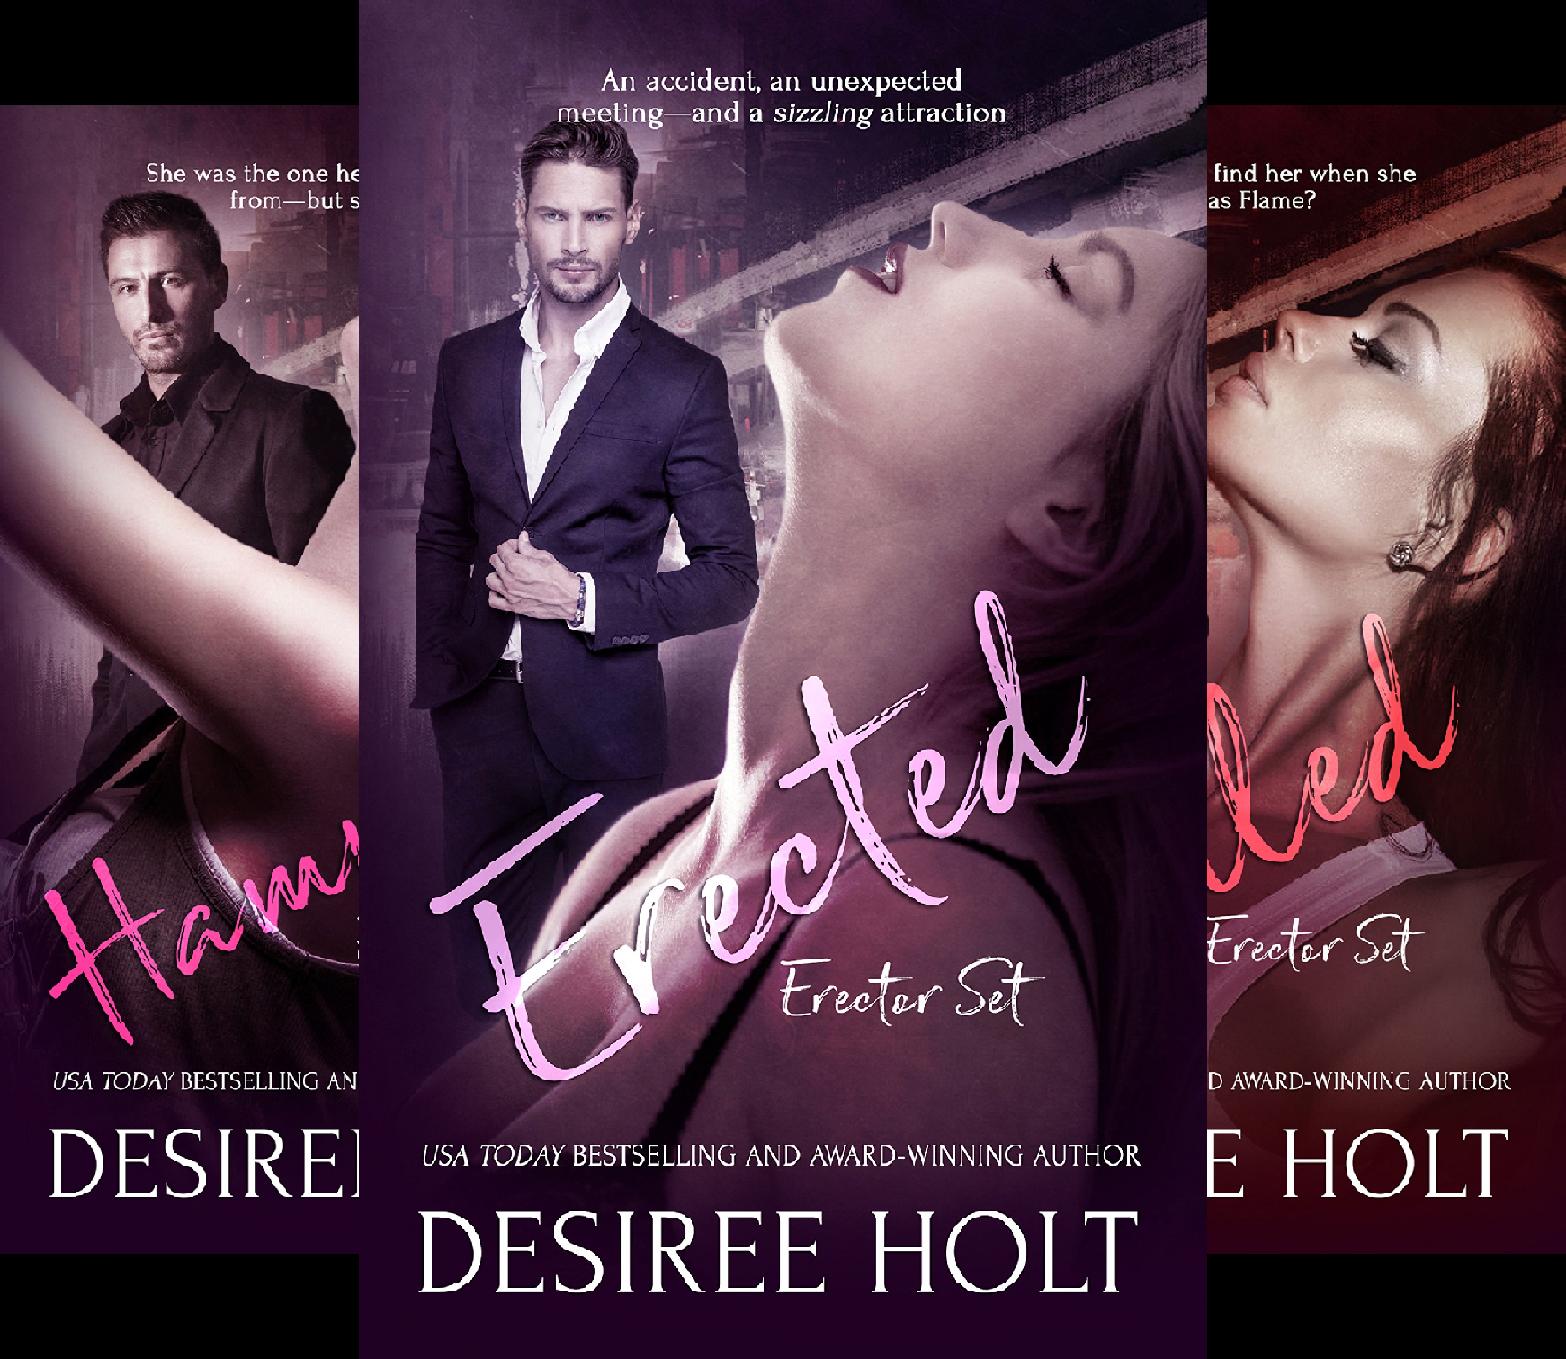 Erector Set (3 Book Series)